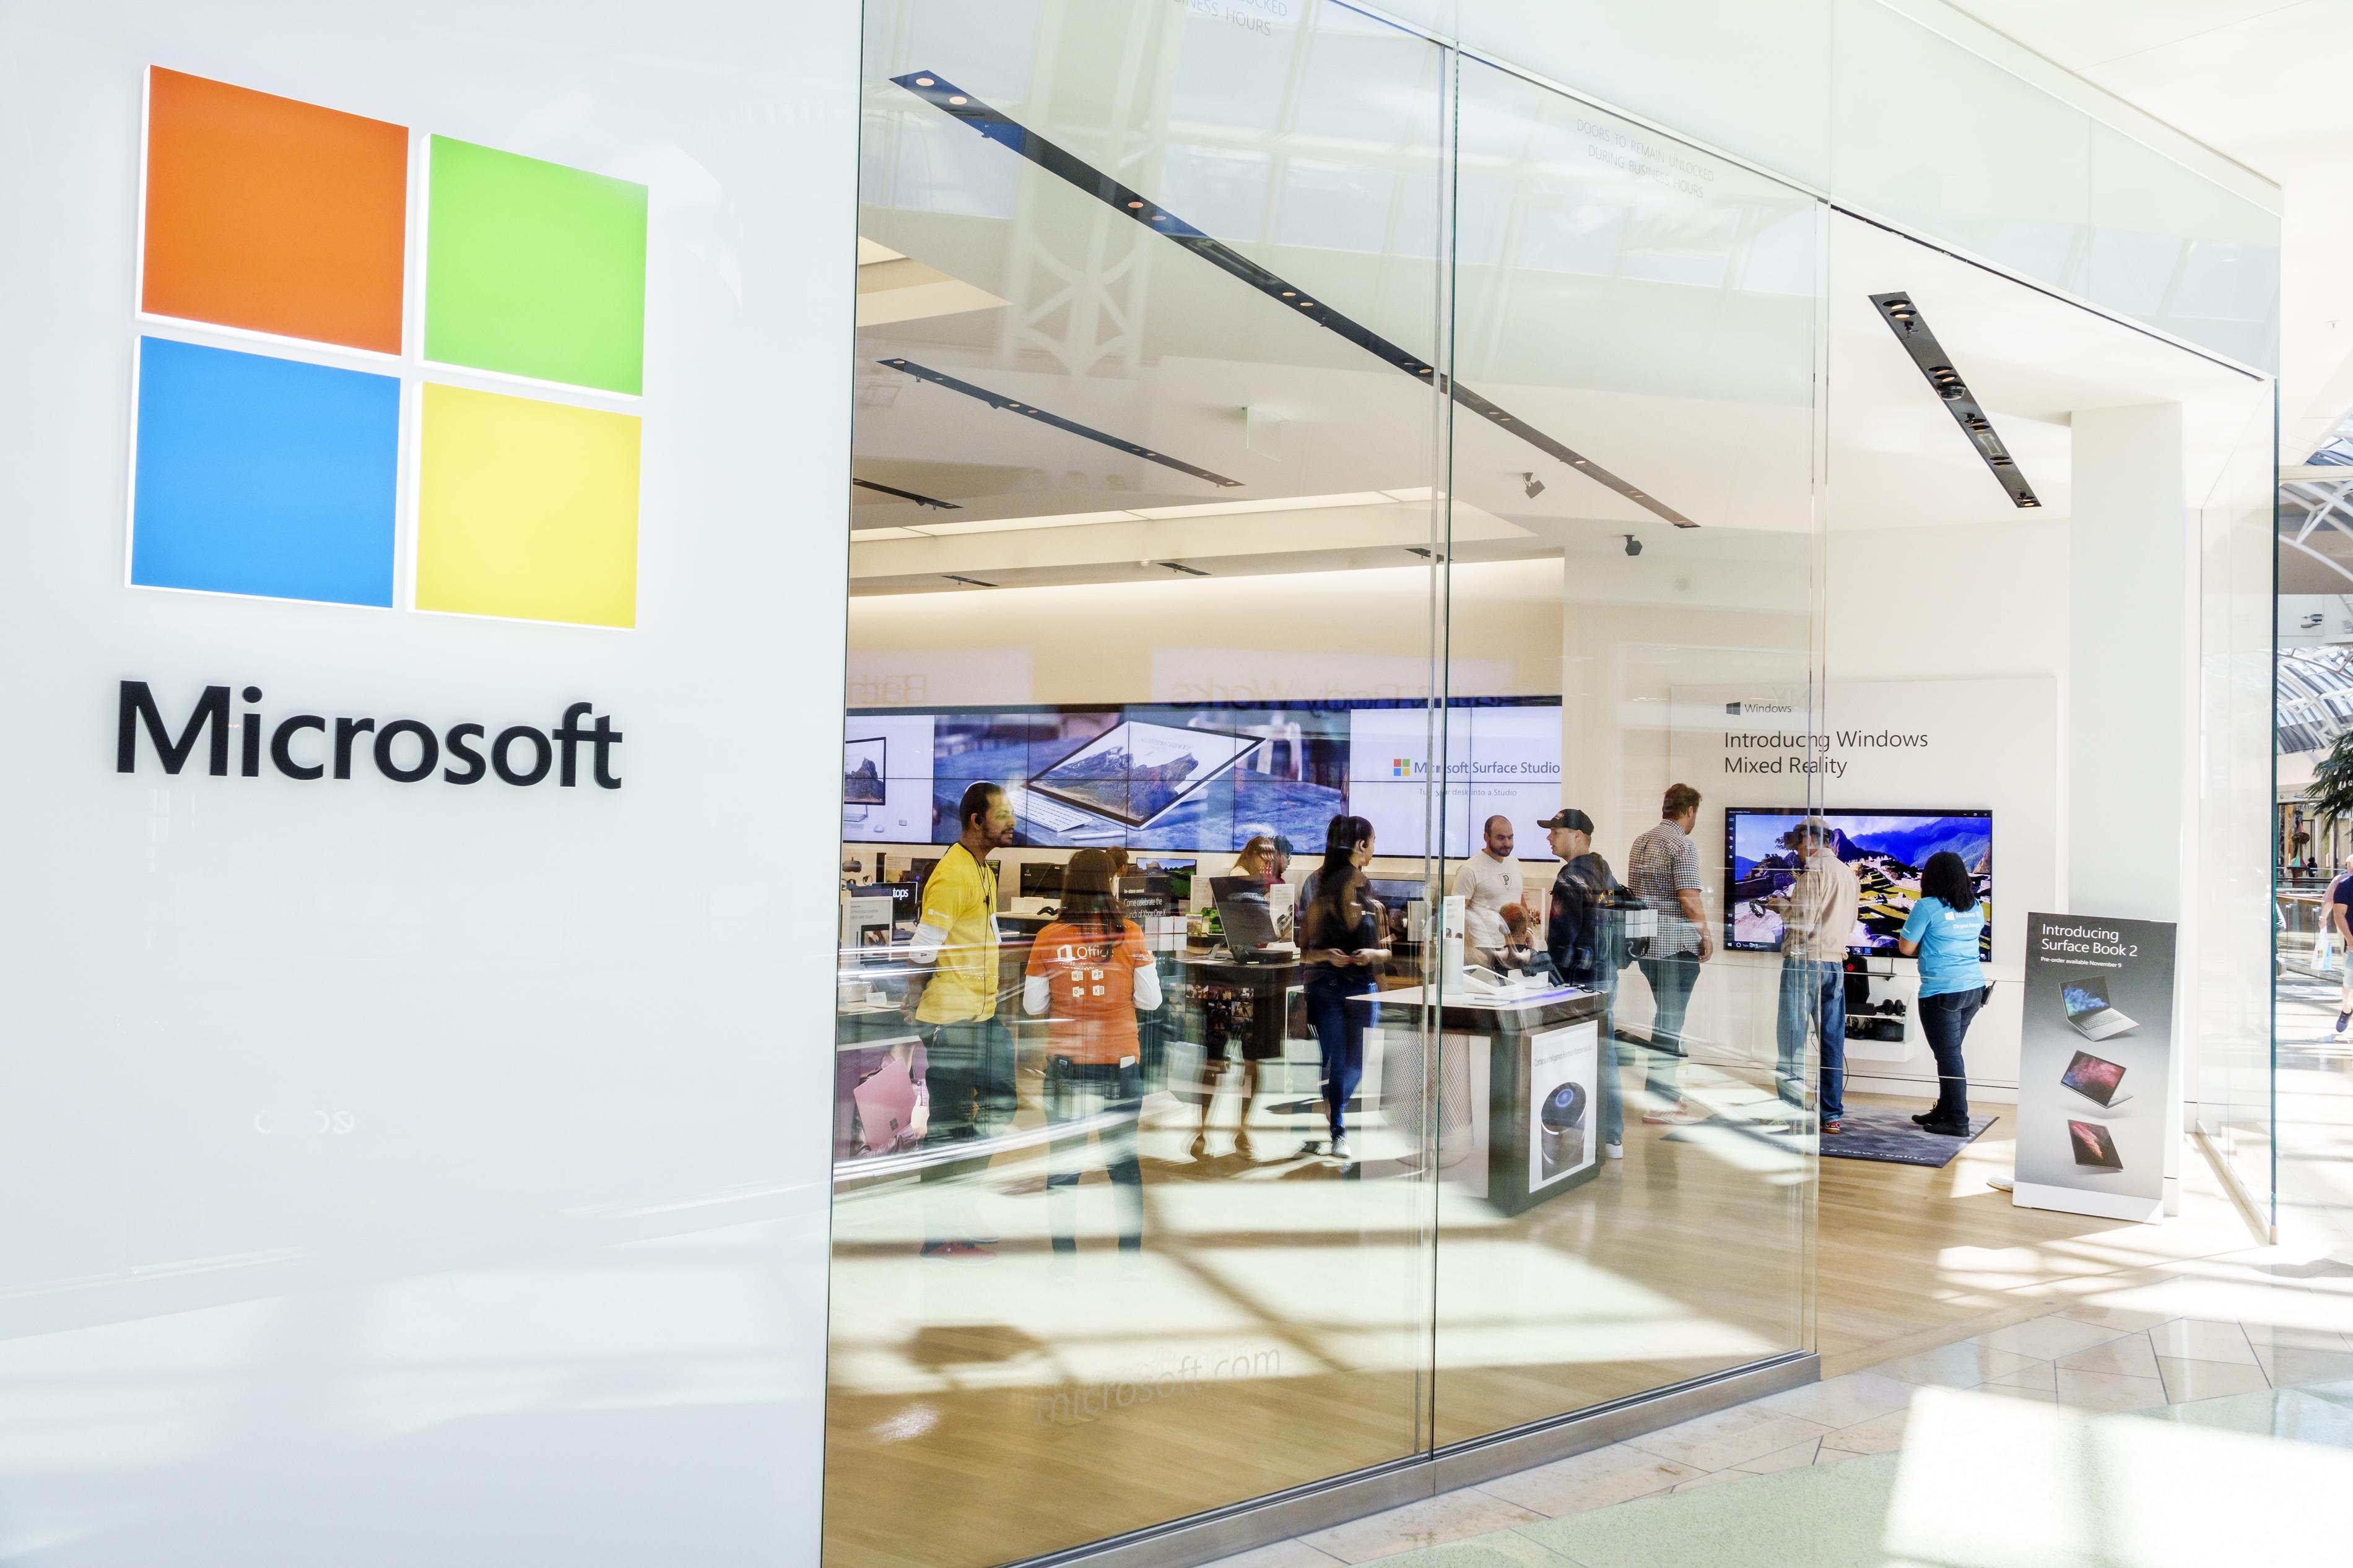 Orlando, The Mall at Millennia, Microsoft, retail computer store